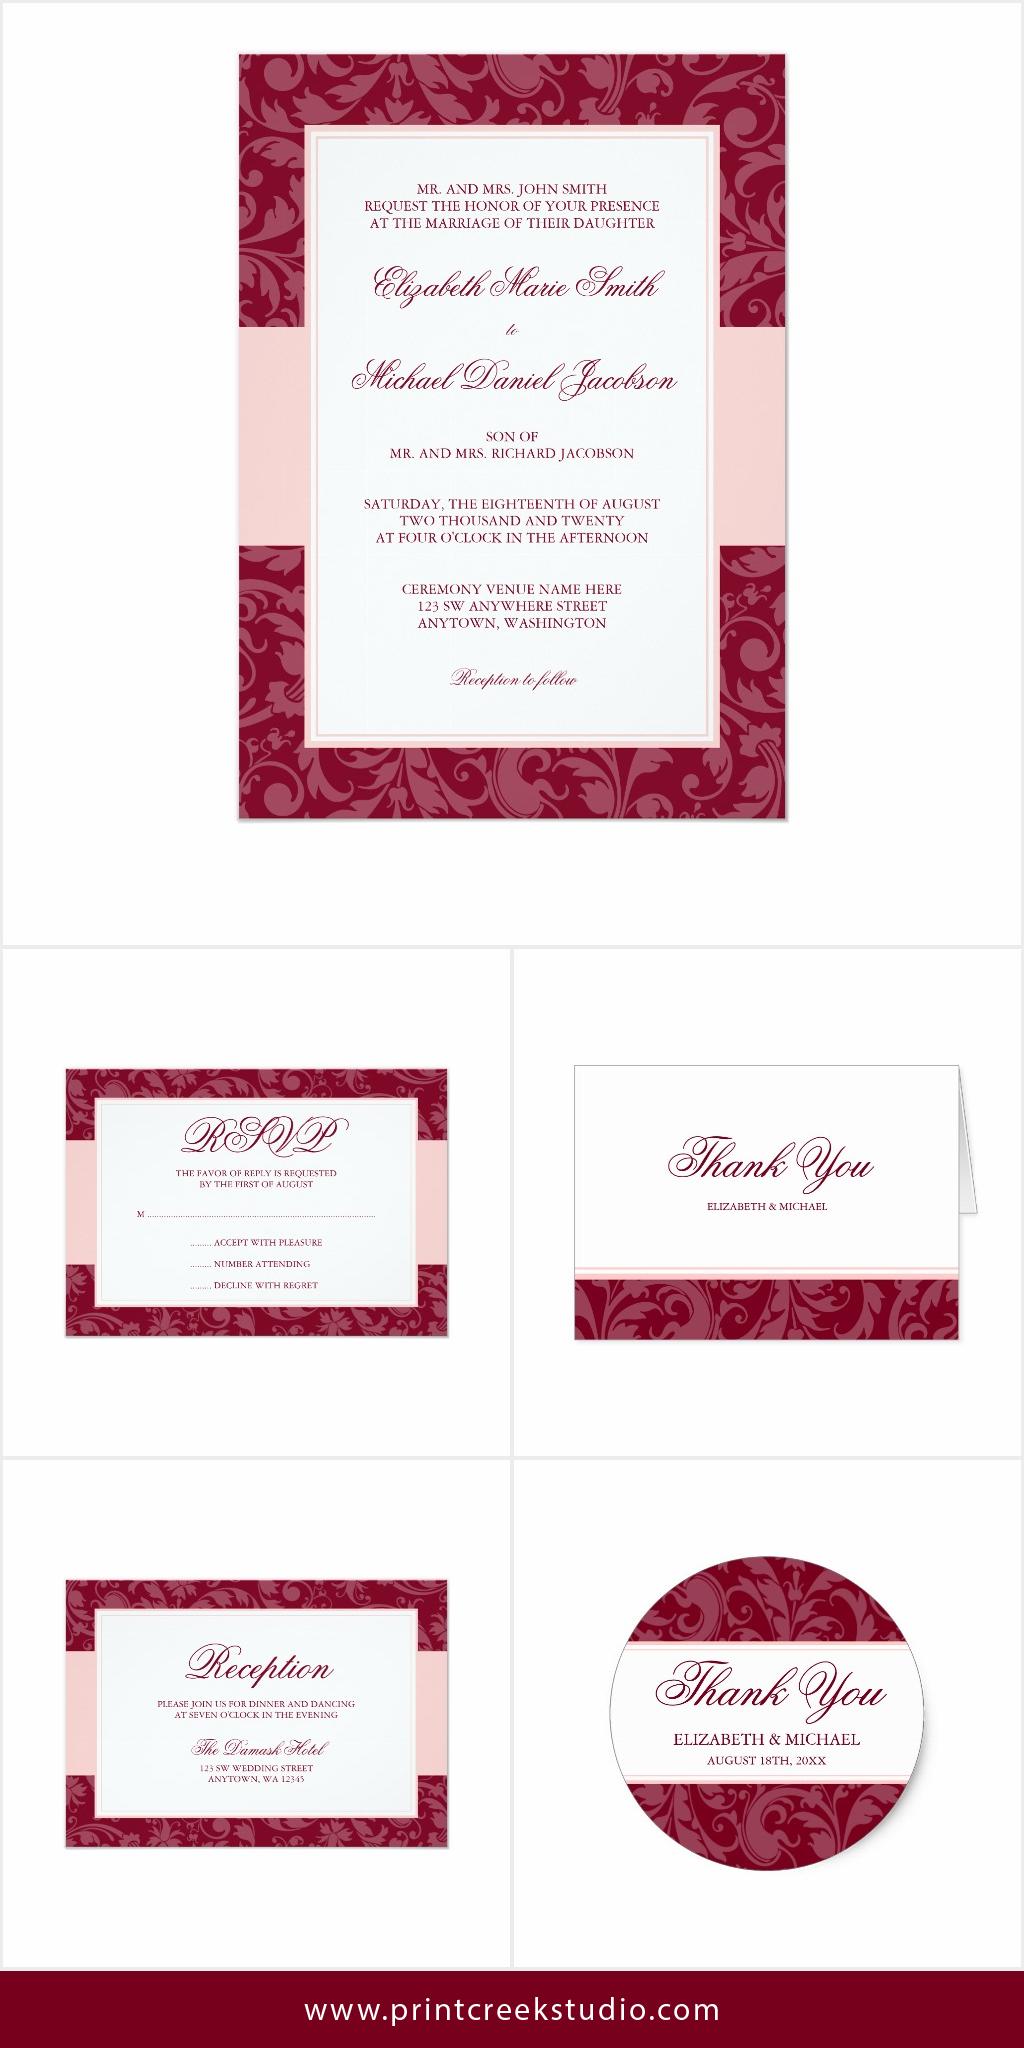 Burgundy and blush pink damask swirl wedding invitation suite. An ...